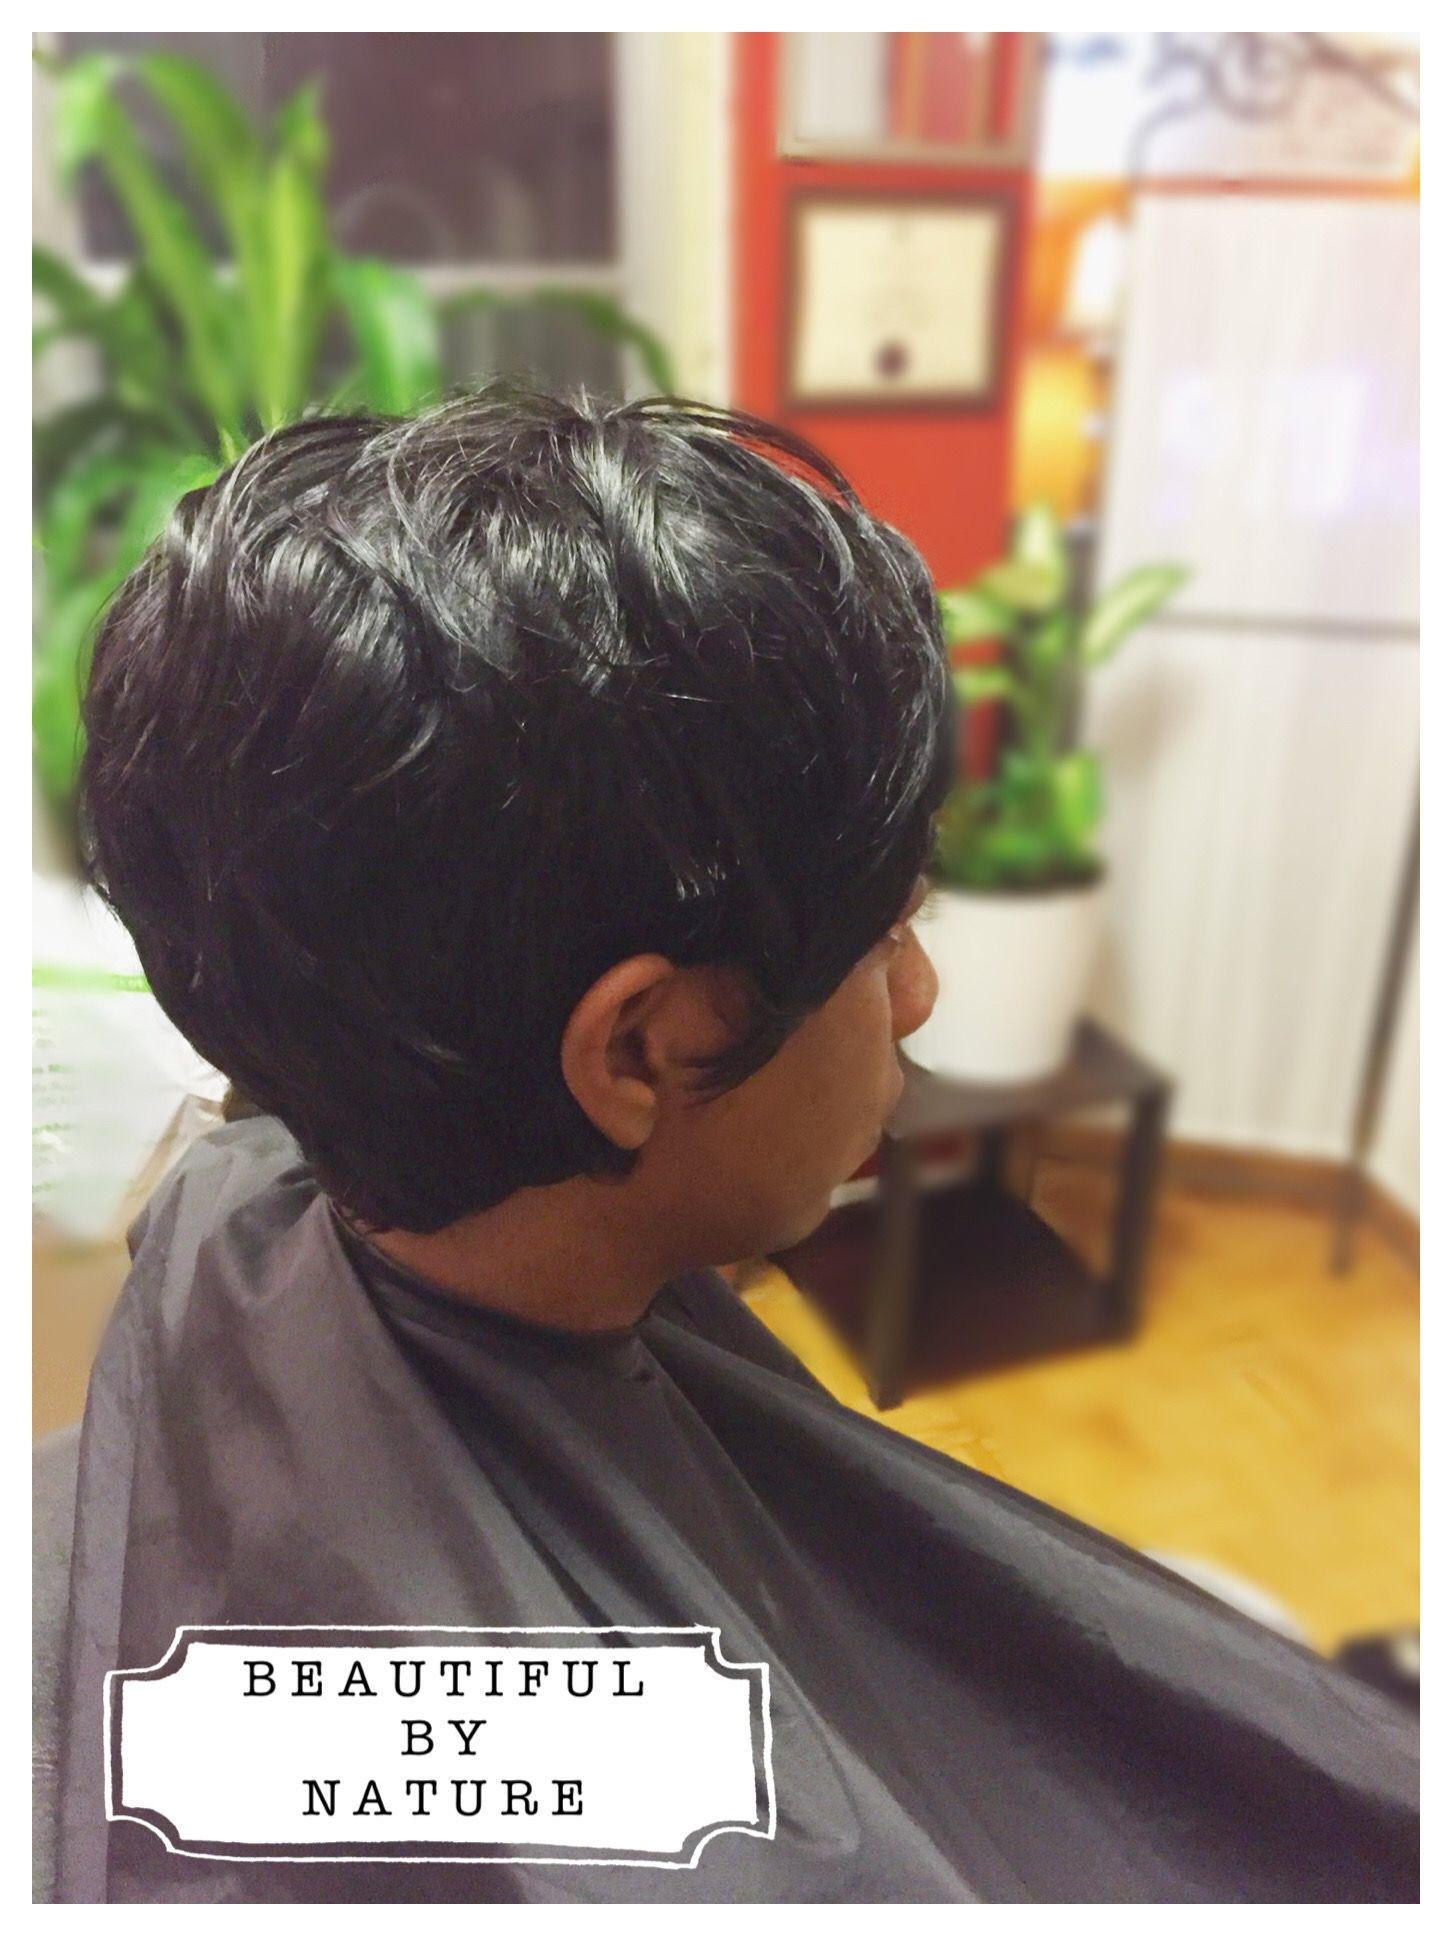 Pixie Cut Haircut Using Bump Hair Extensions Instagram Beautiful